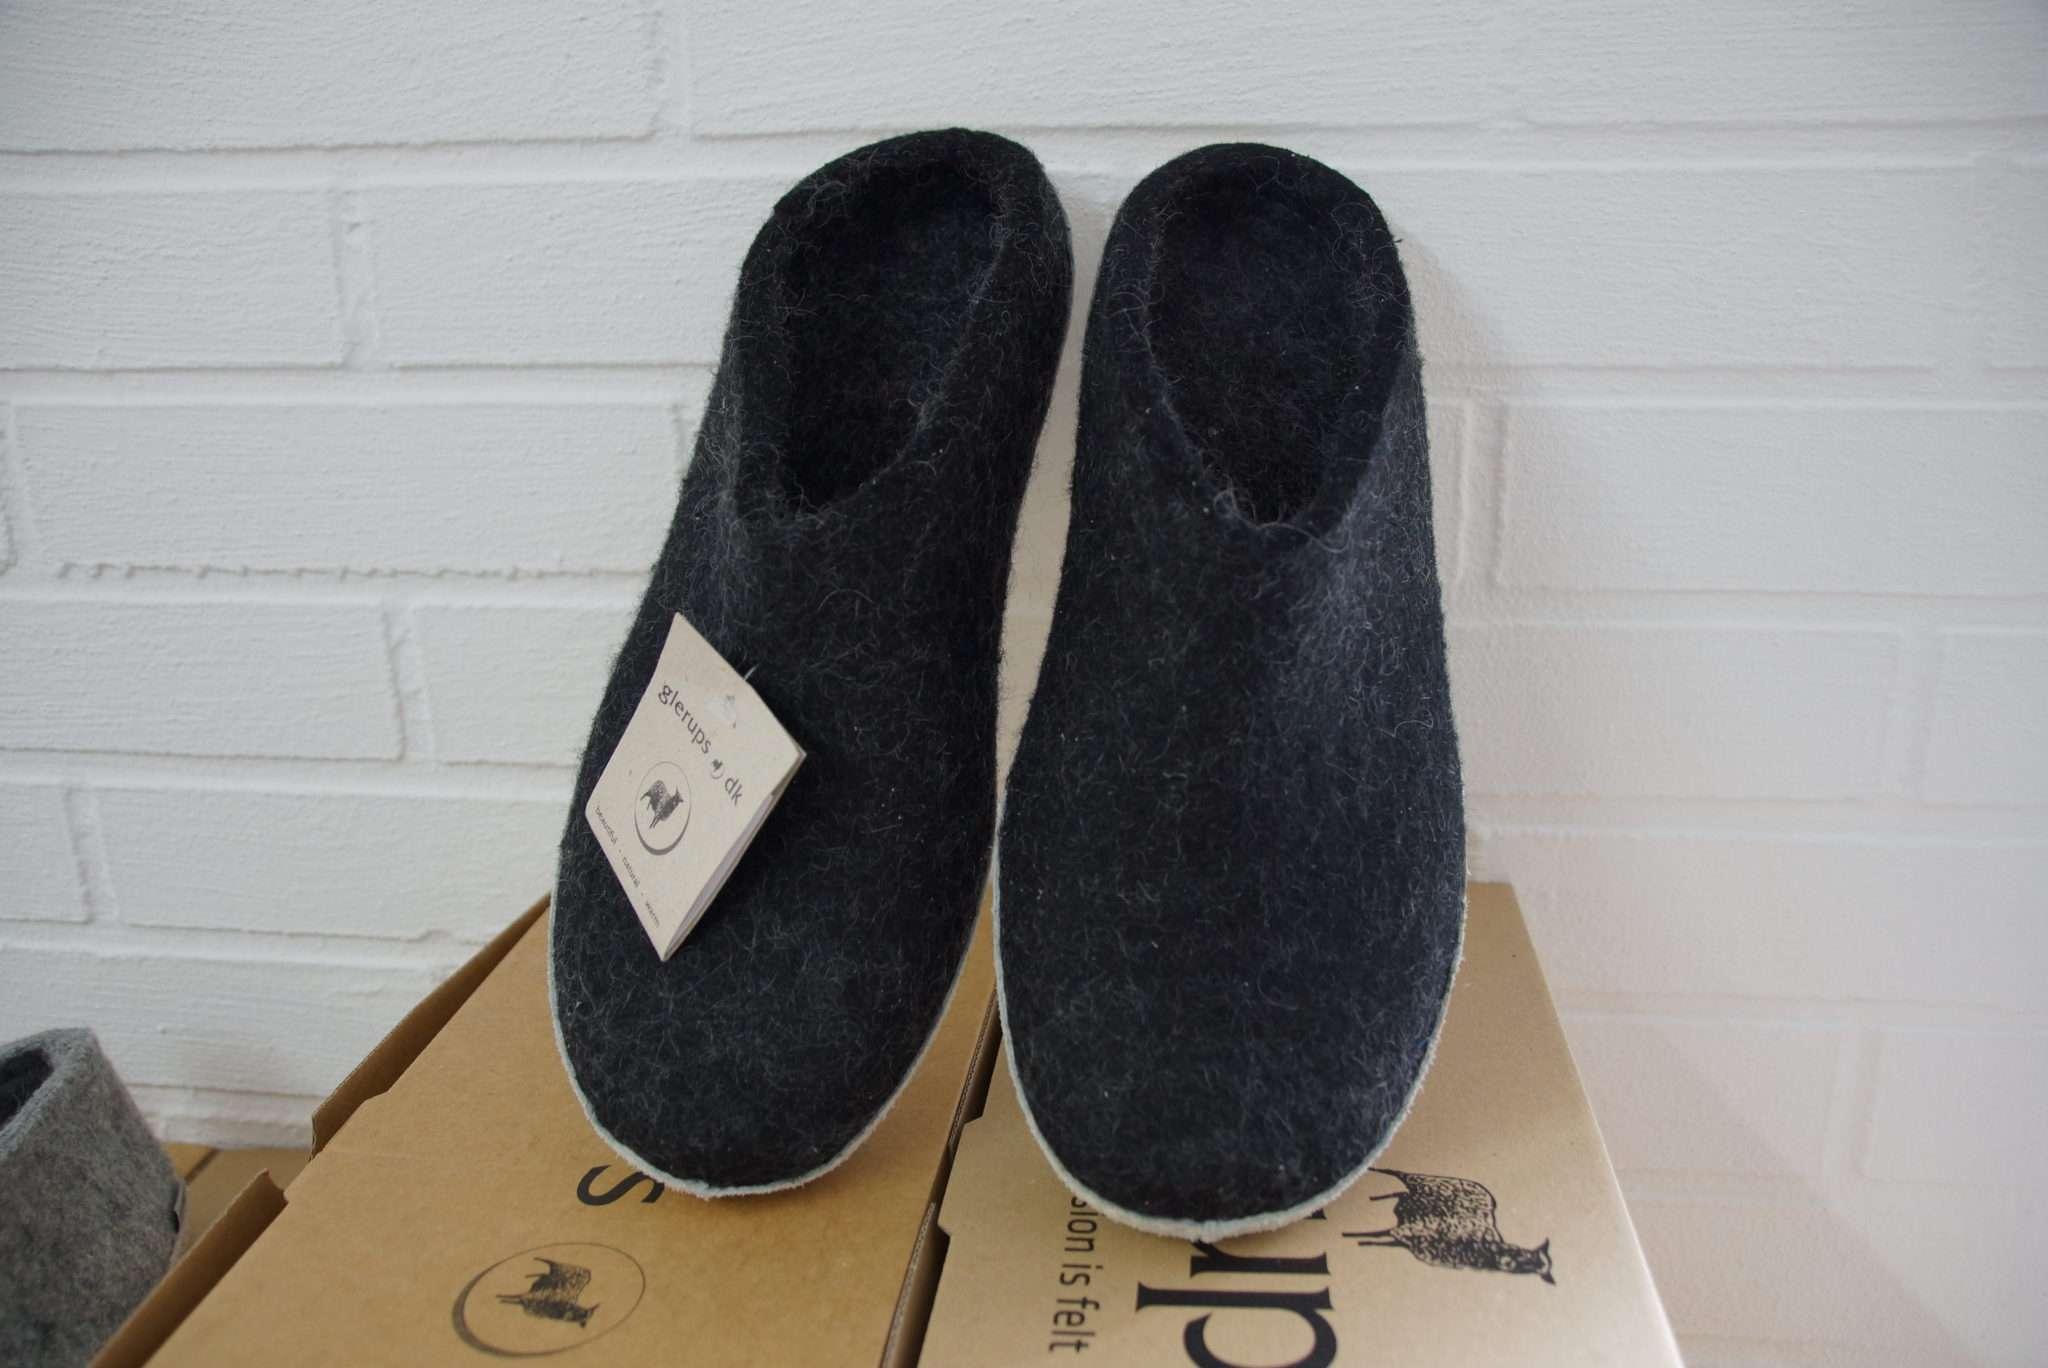 best sneakers 3cc4a 8c4a7 Filz-Schuhe